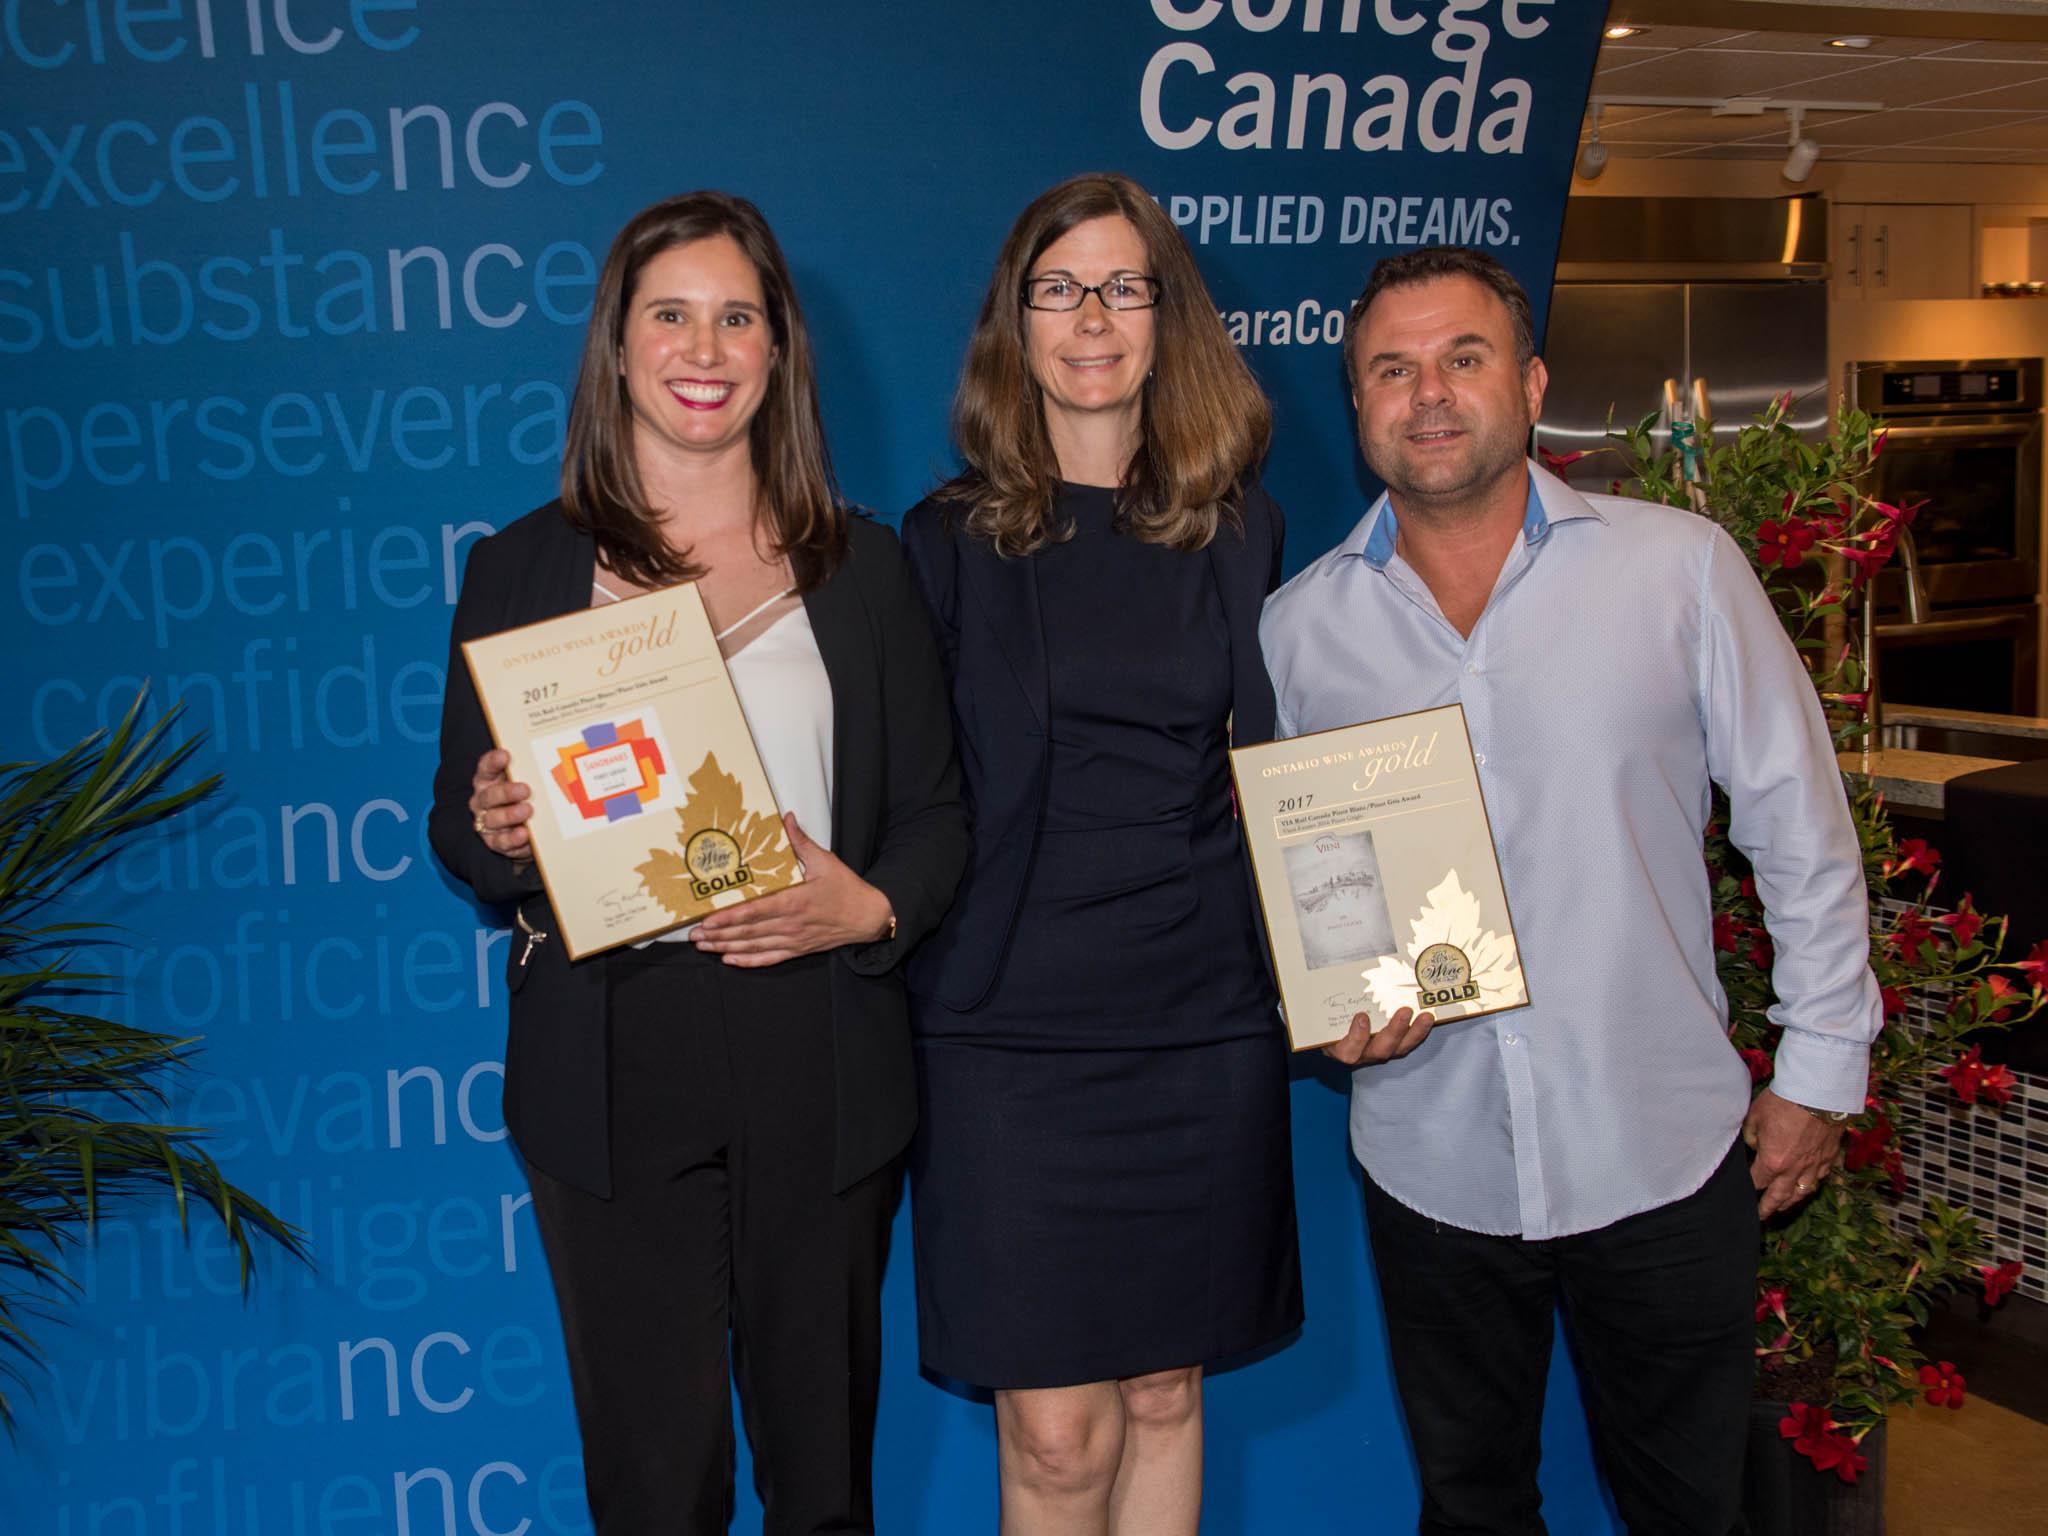 Pinot Blanc/Pinot Gris Award: